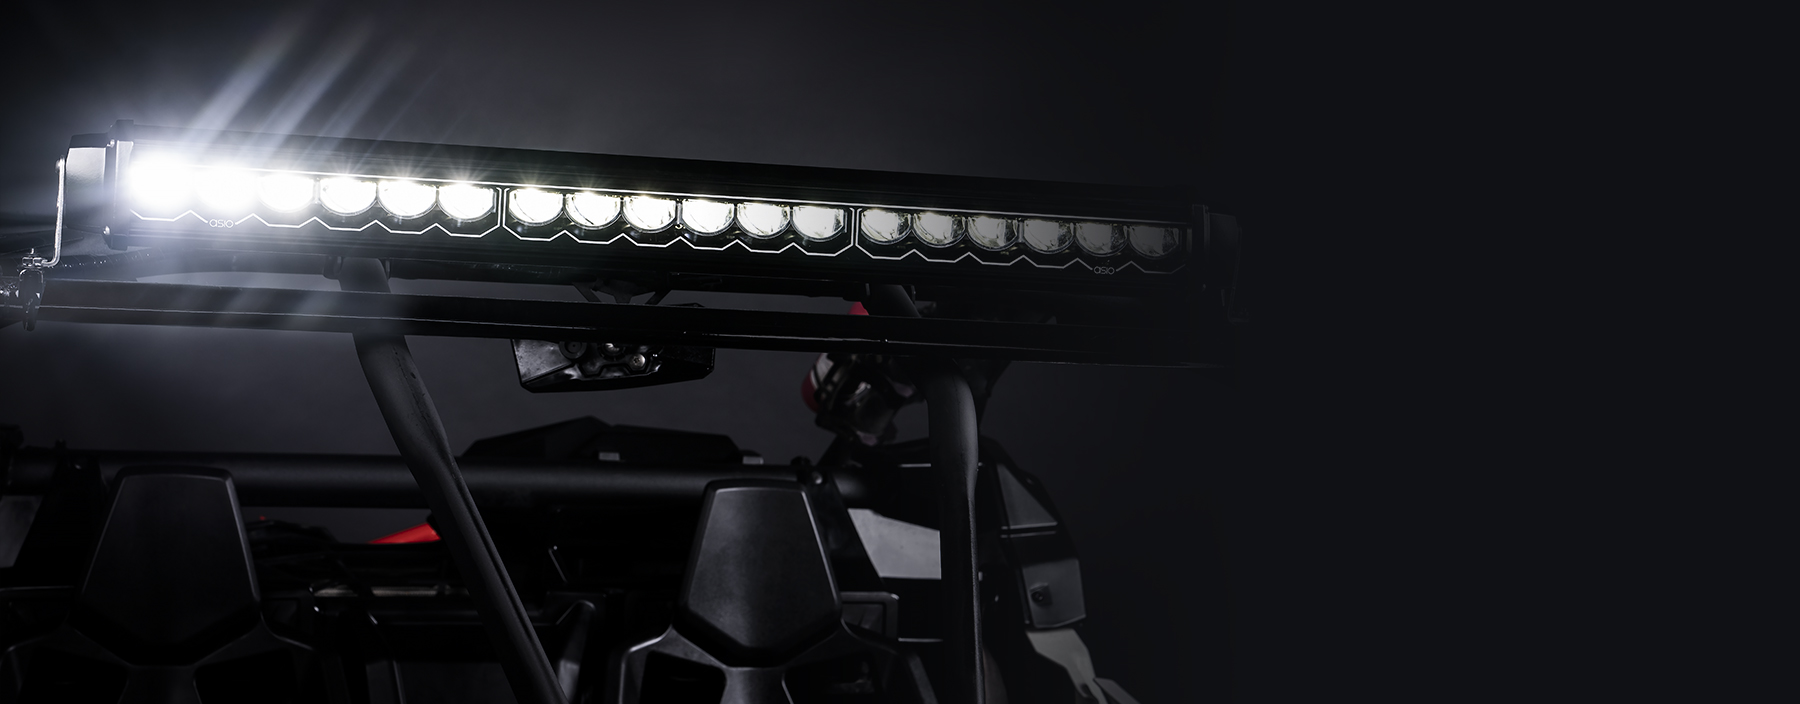 Barre de lumière adaptative Asio Evo